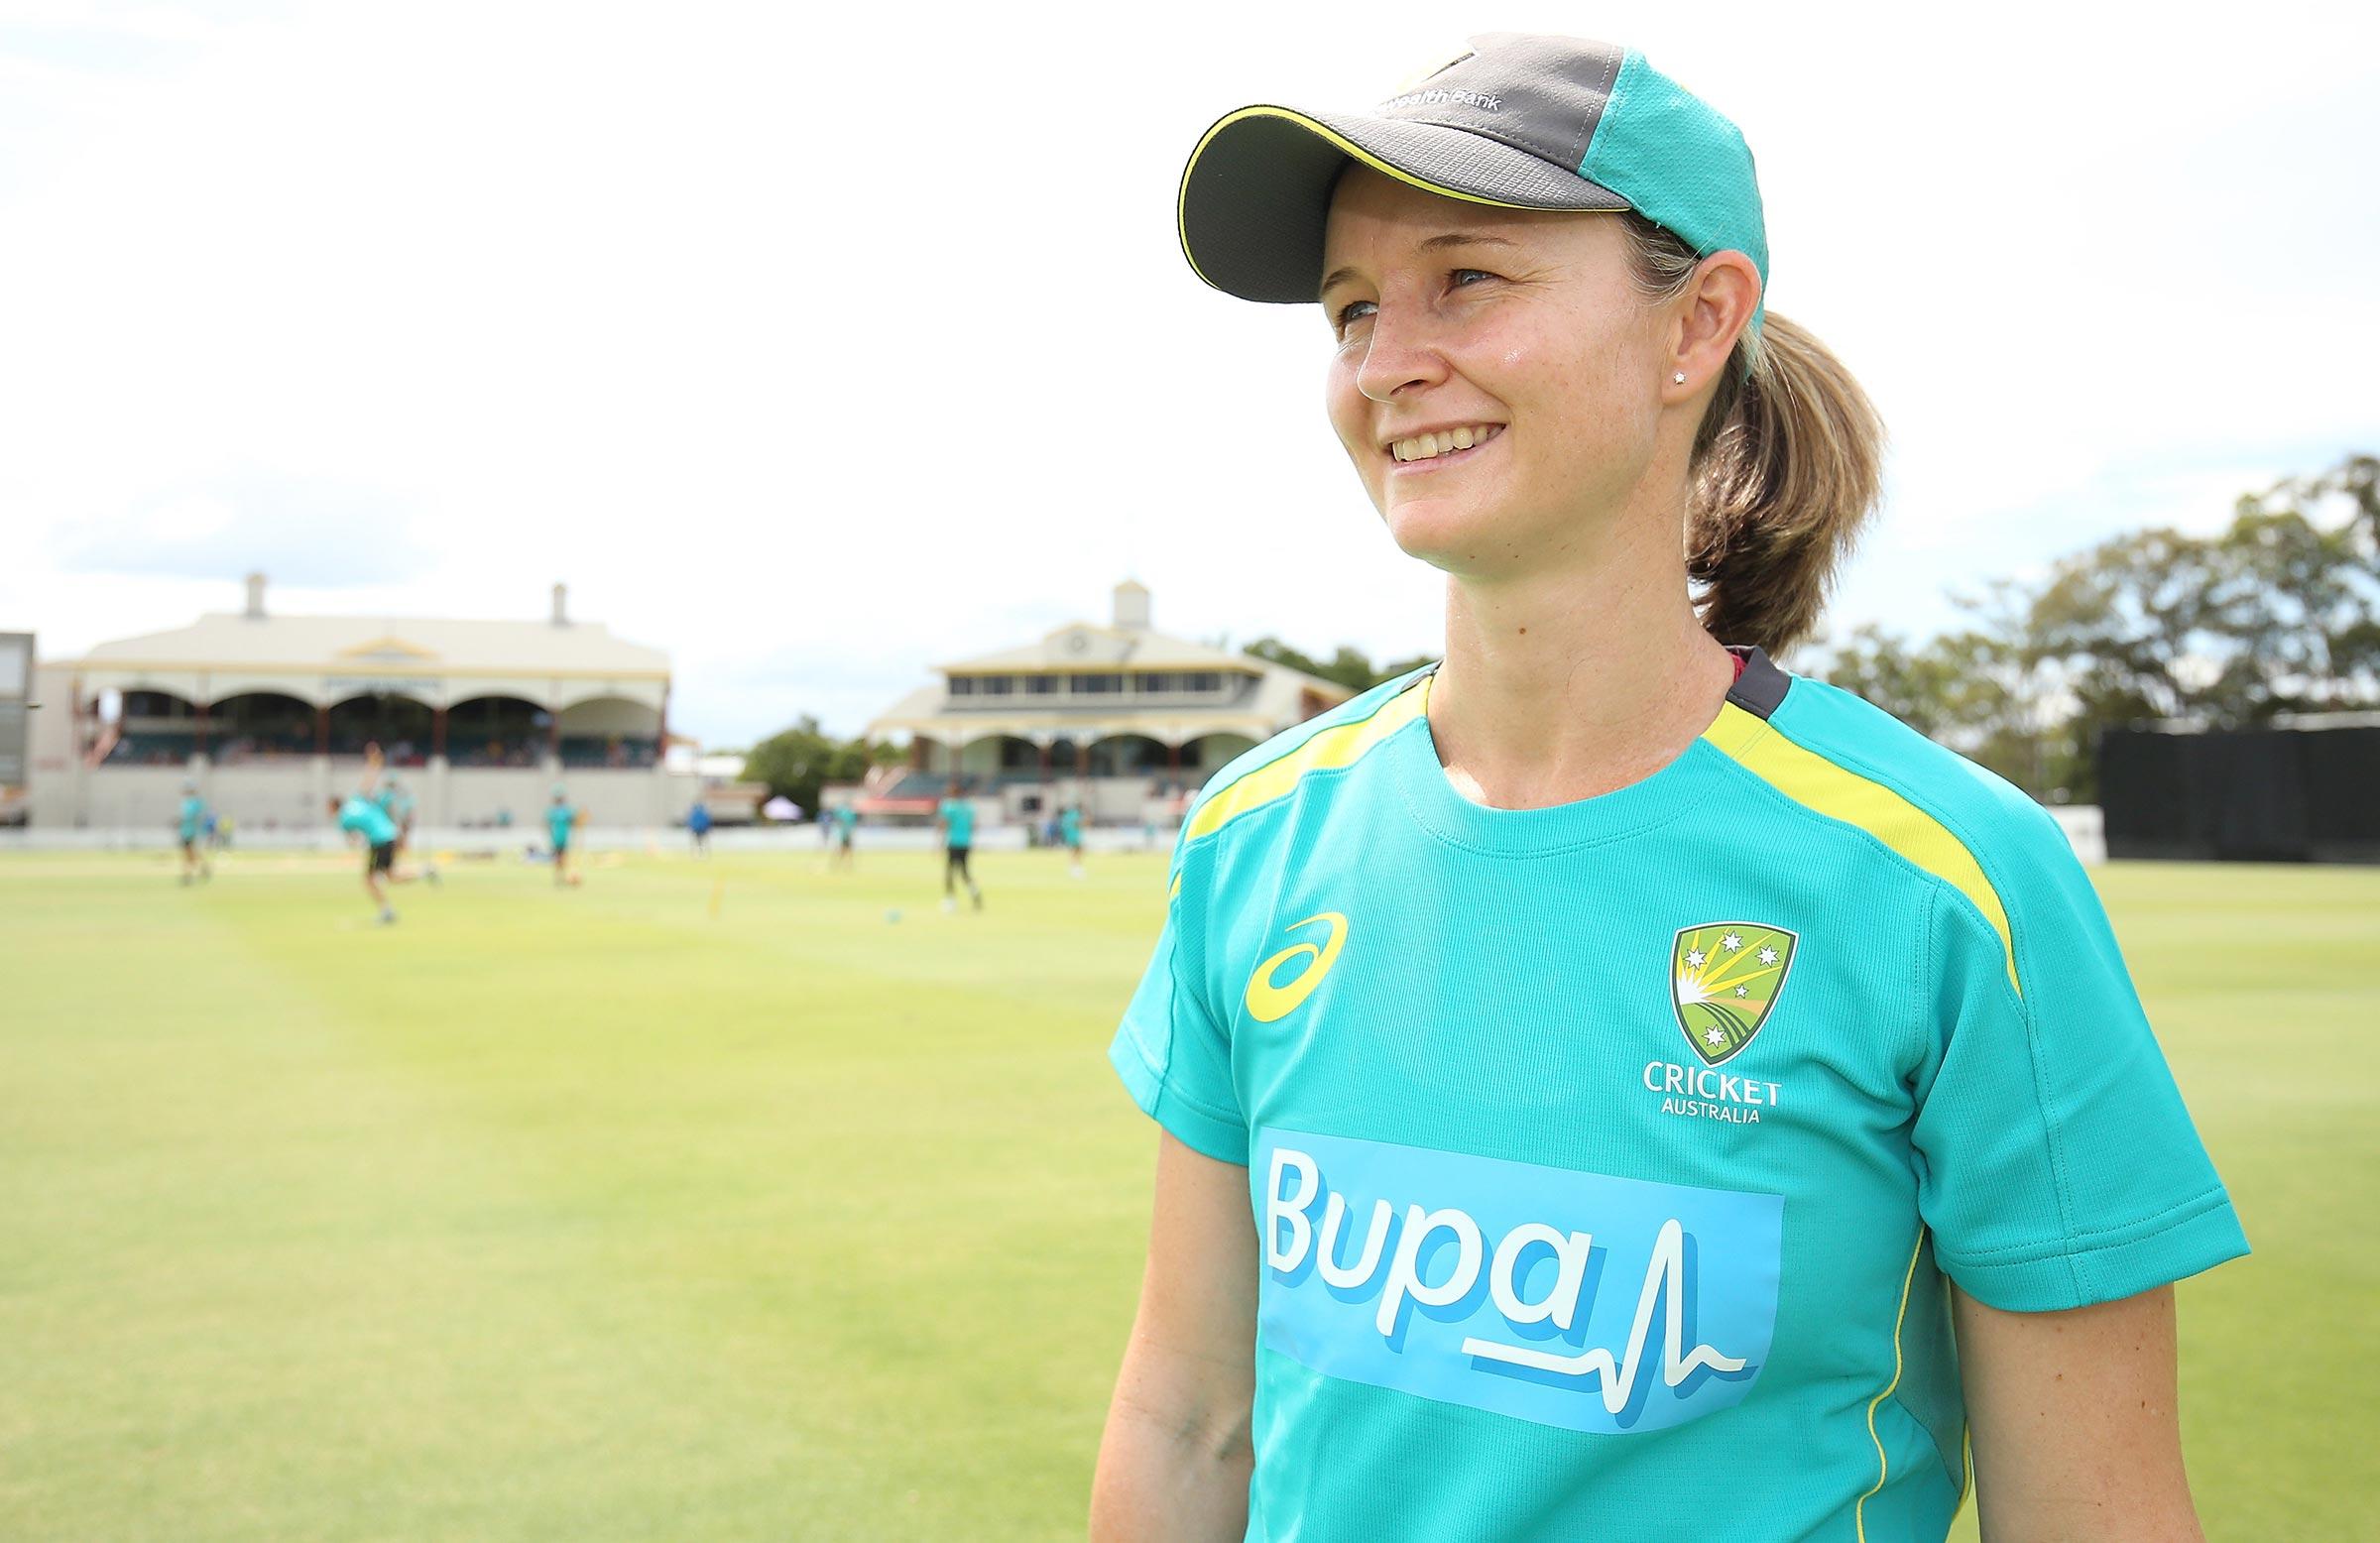 New Stars coach Poulton quits to head home | cricket.com.au